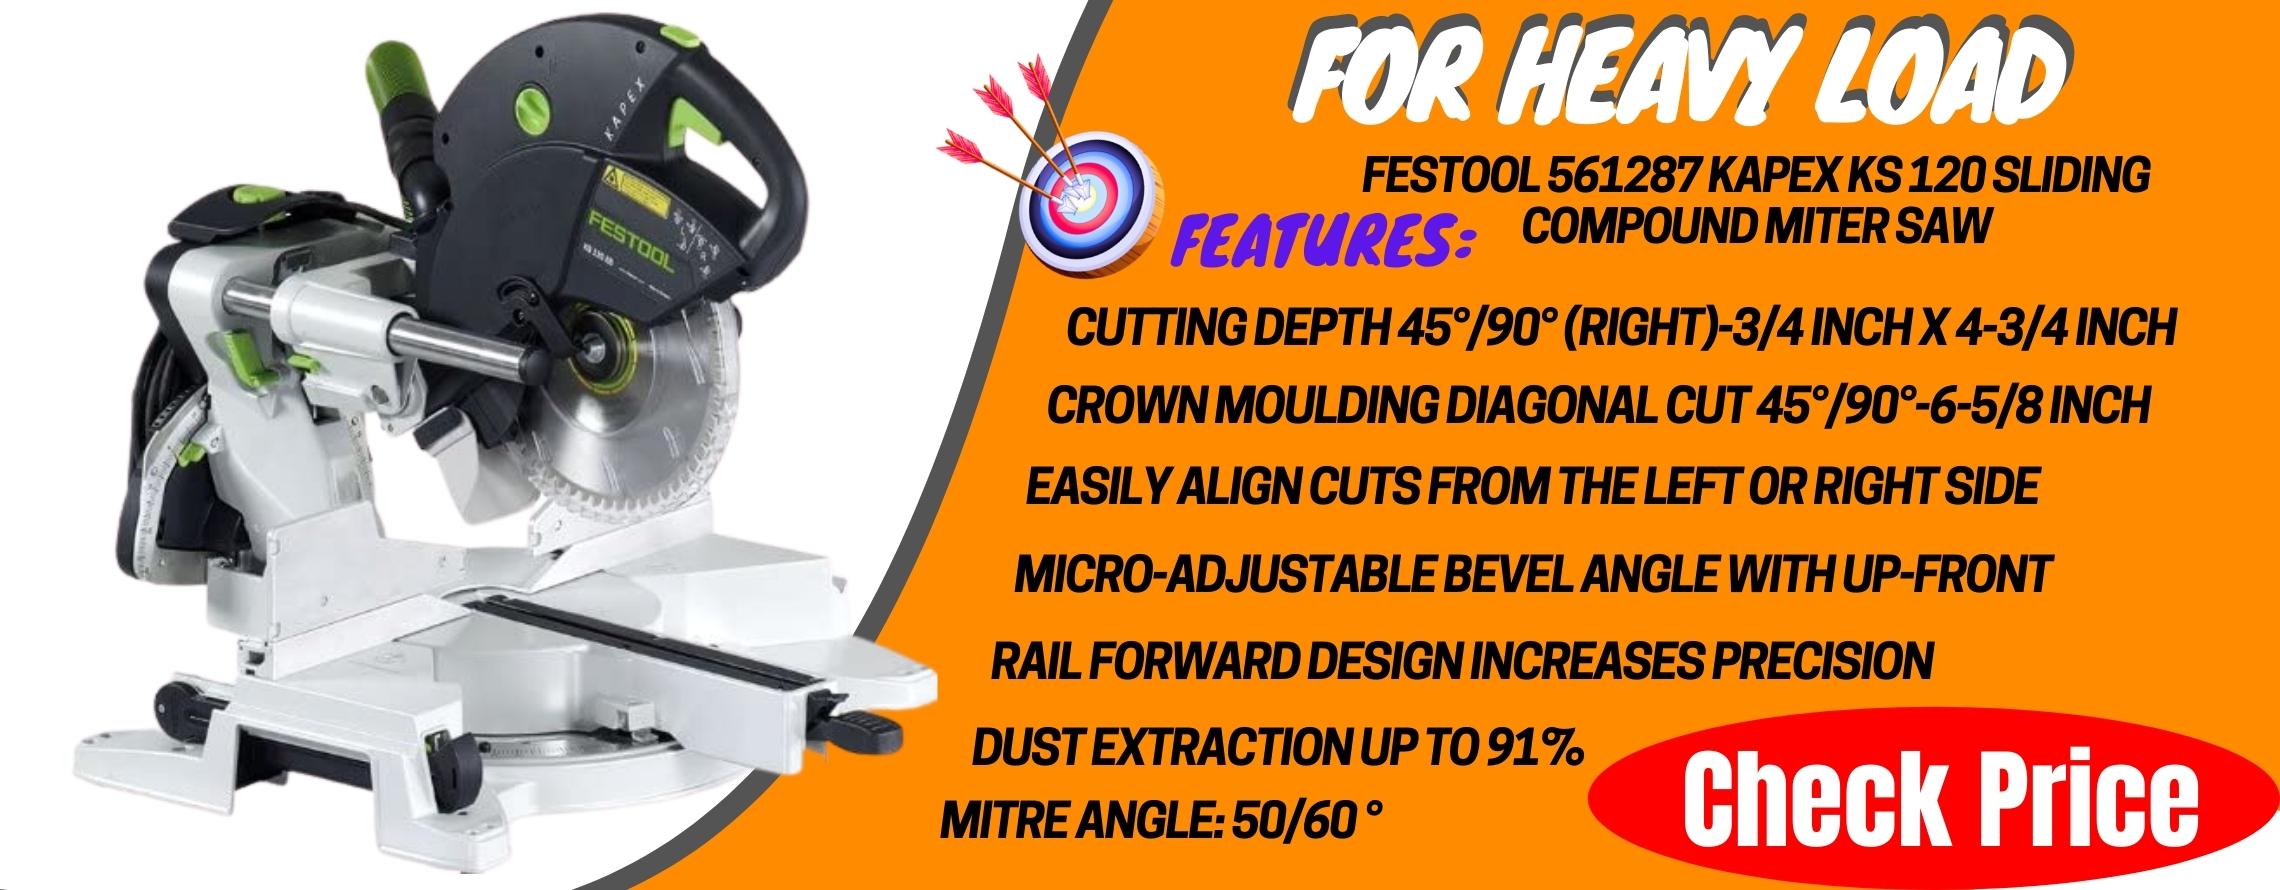 Festool 561287 Kapex KS 120 Sliding Compound Miter Saw